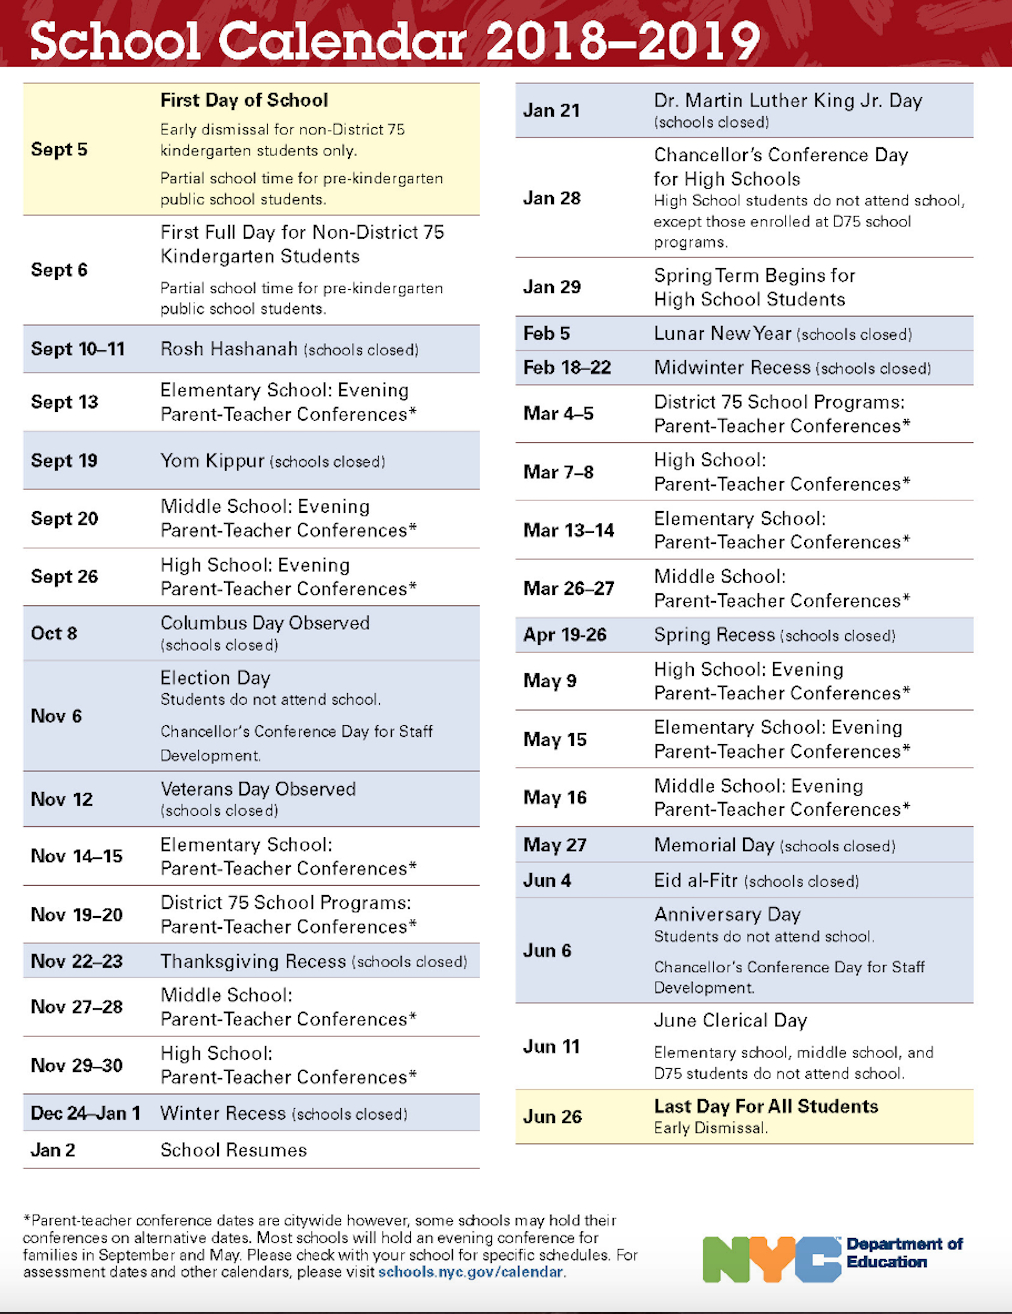 Nyc Doe 2018-2019 School Calendar | Ps 373R Robert Randall School Calendar 2019 Nyc